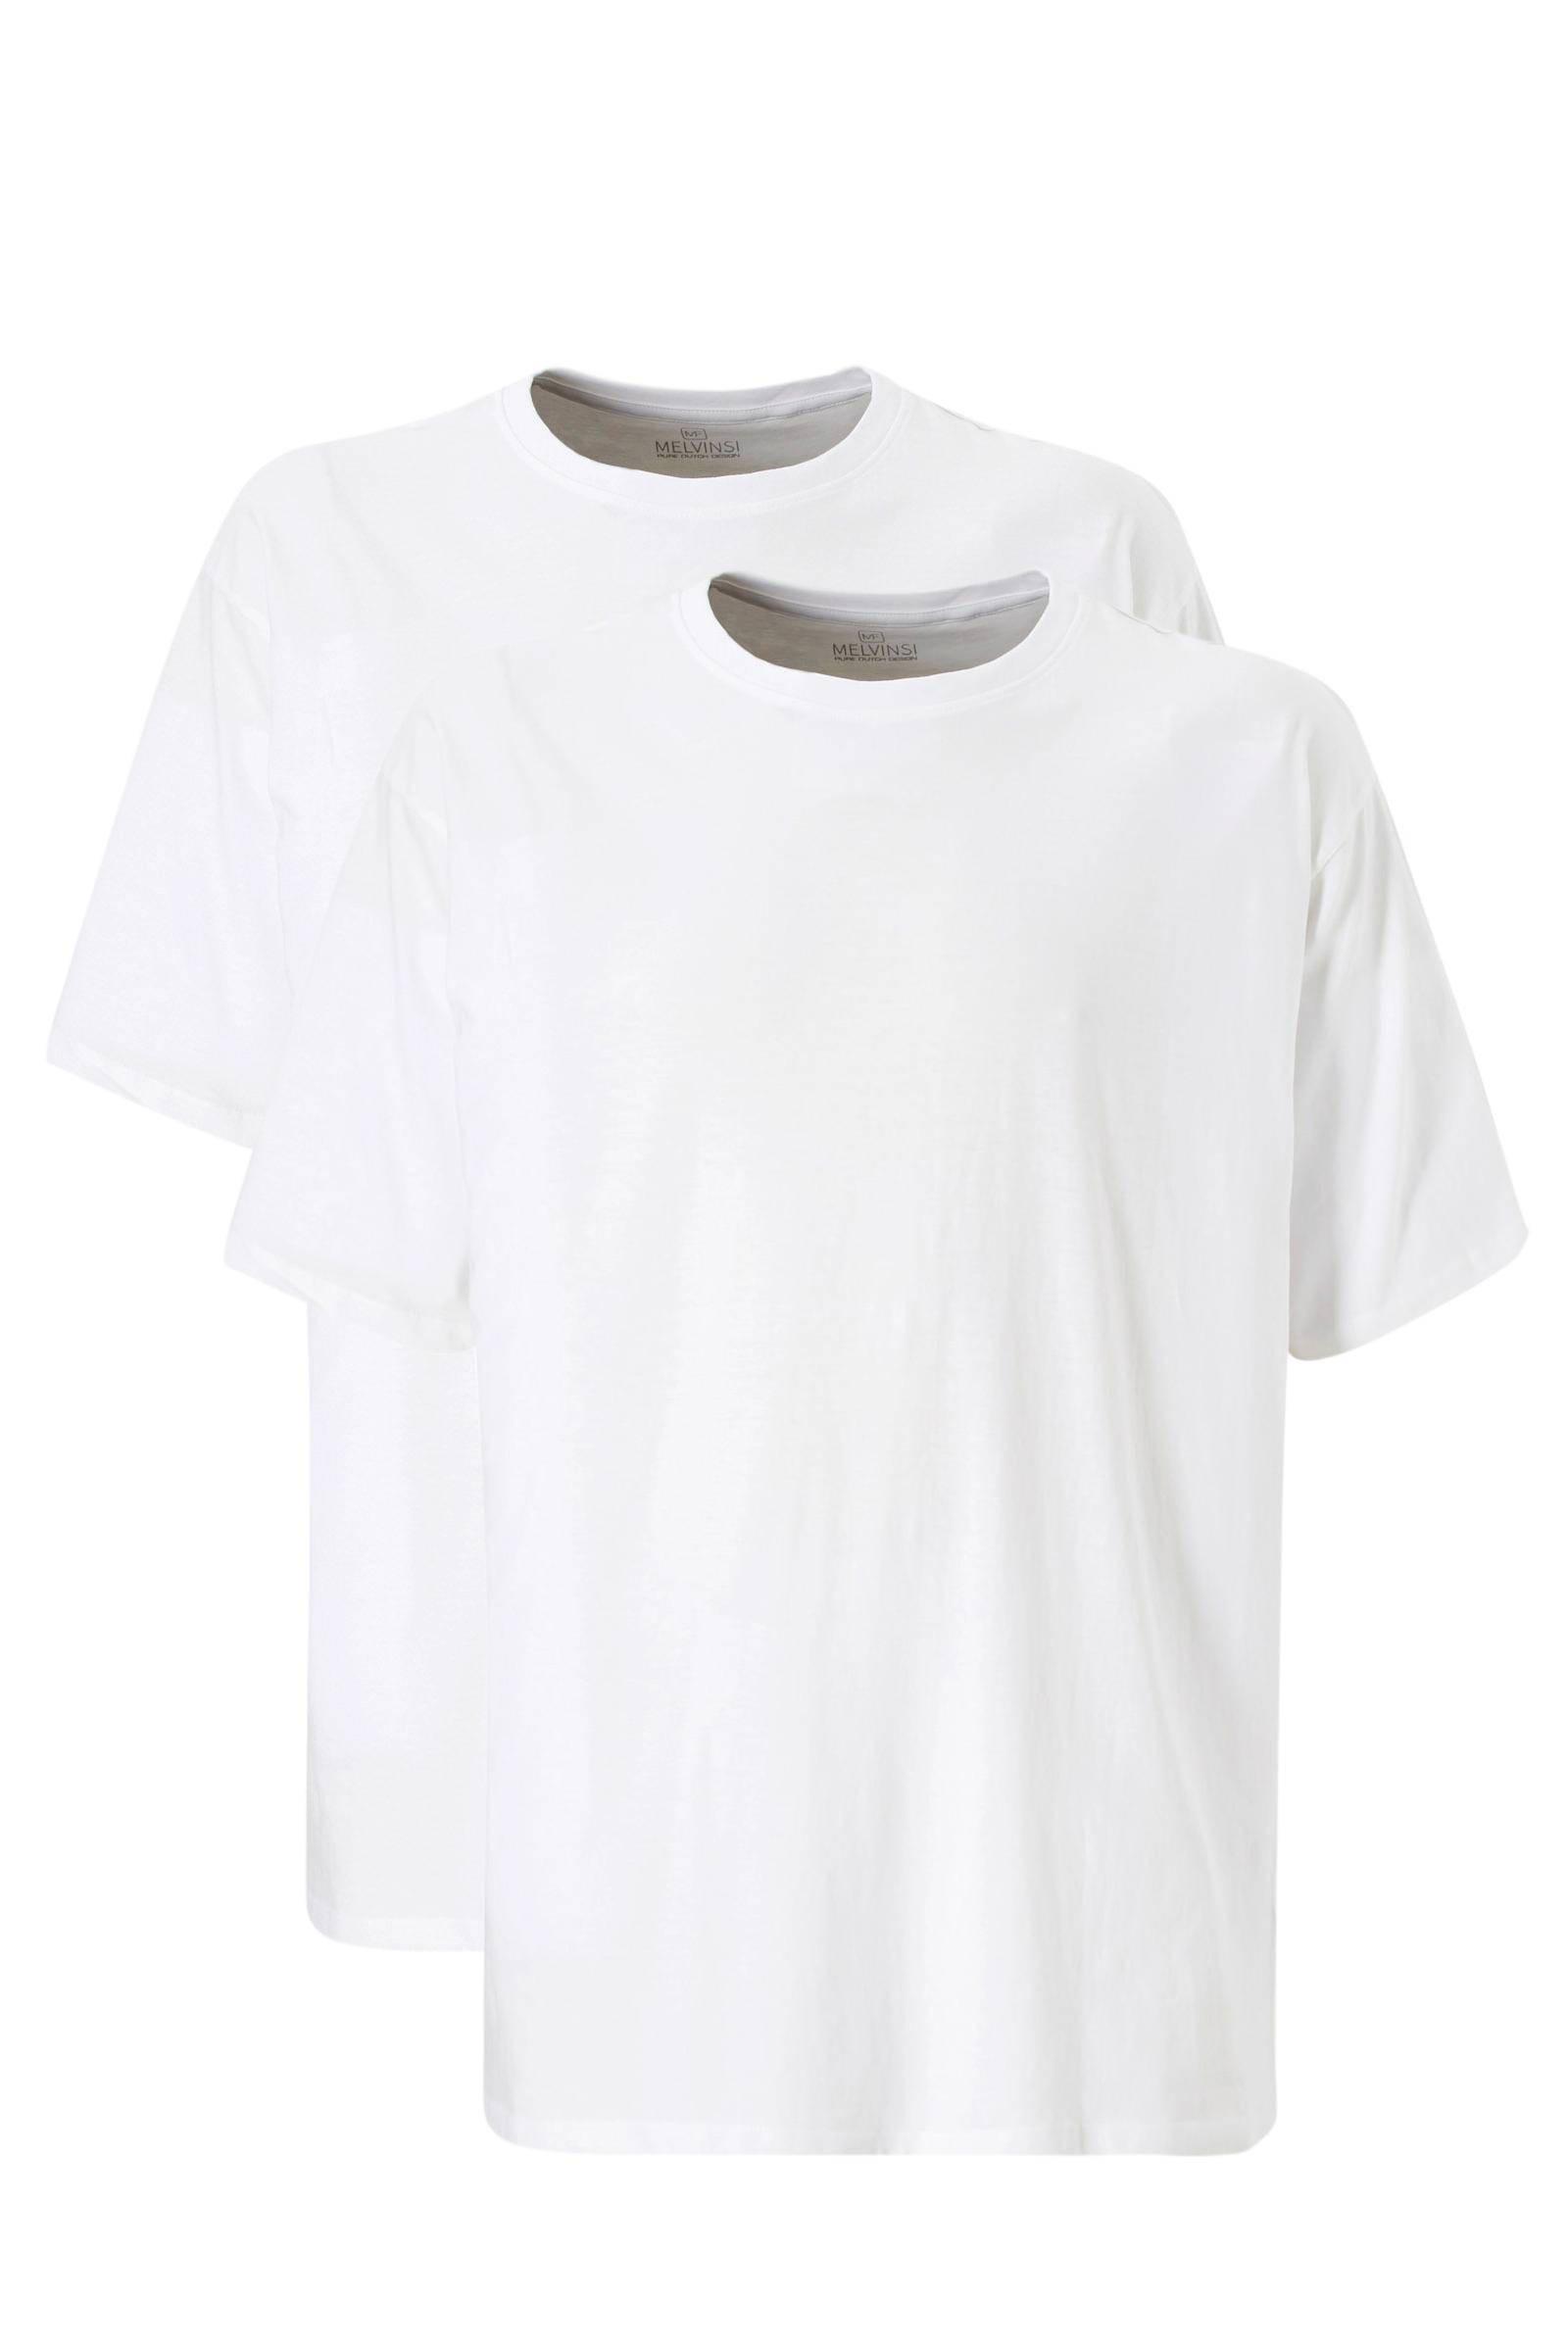 Melvinsi +size + size T-shirt (set van 2)